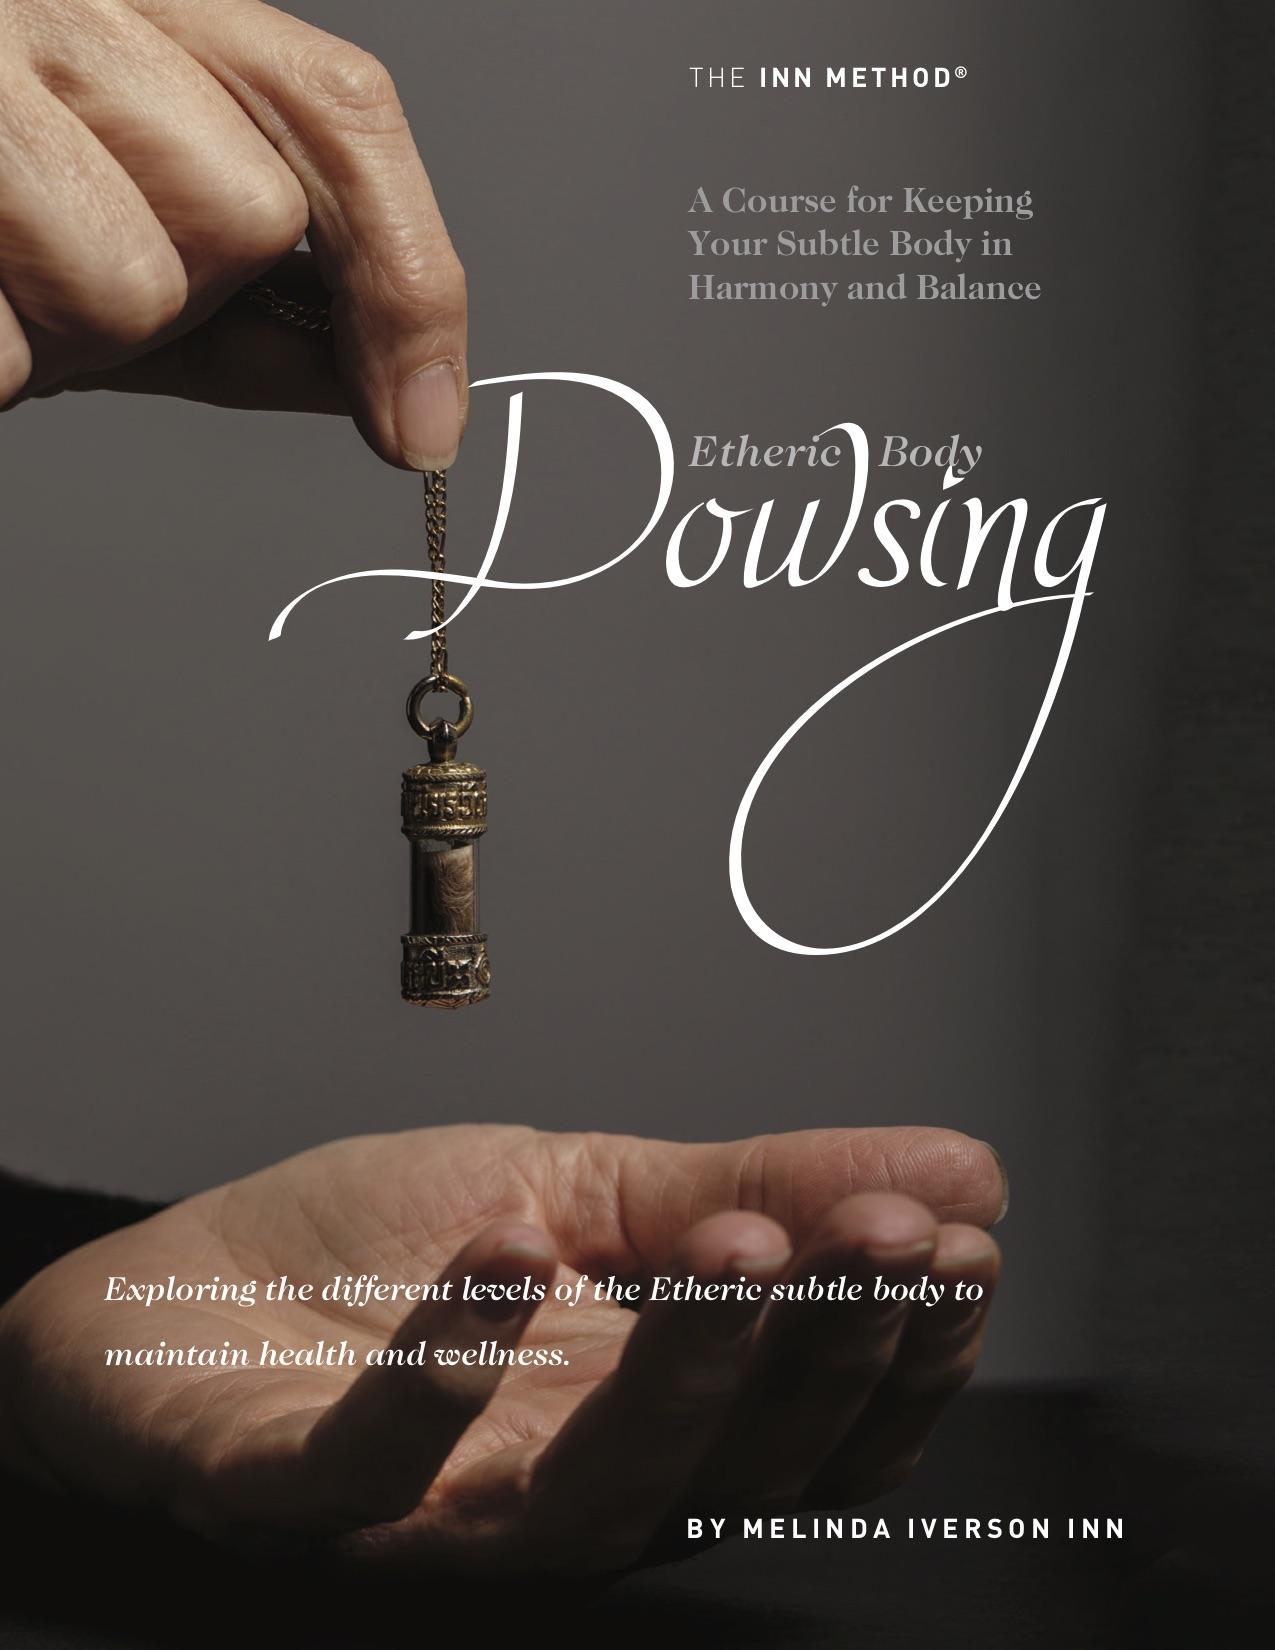 Etheric Body Dowsing Course Book, by Melinda Inn